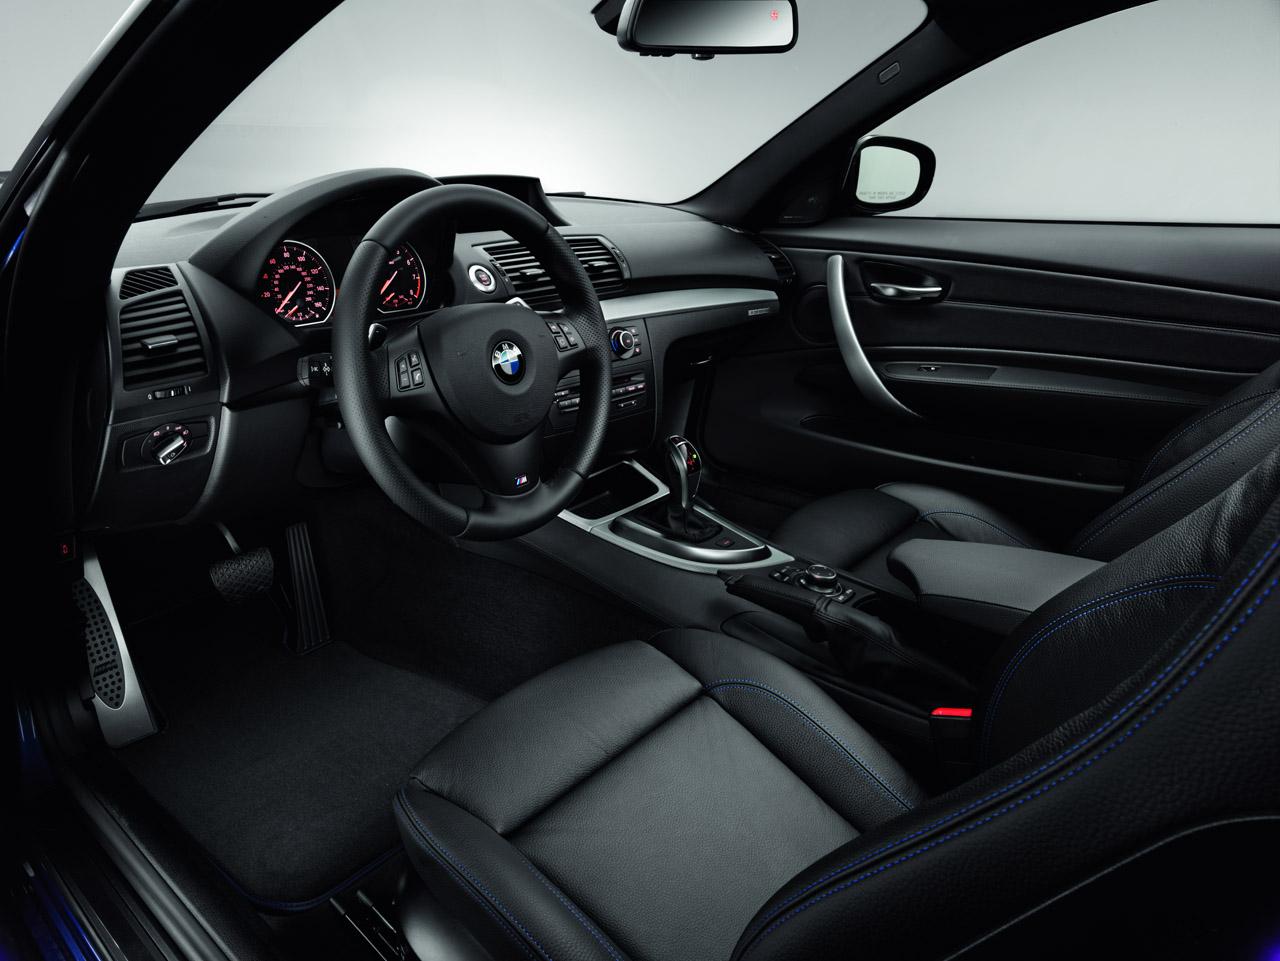 E88 BMW 135is